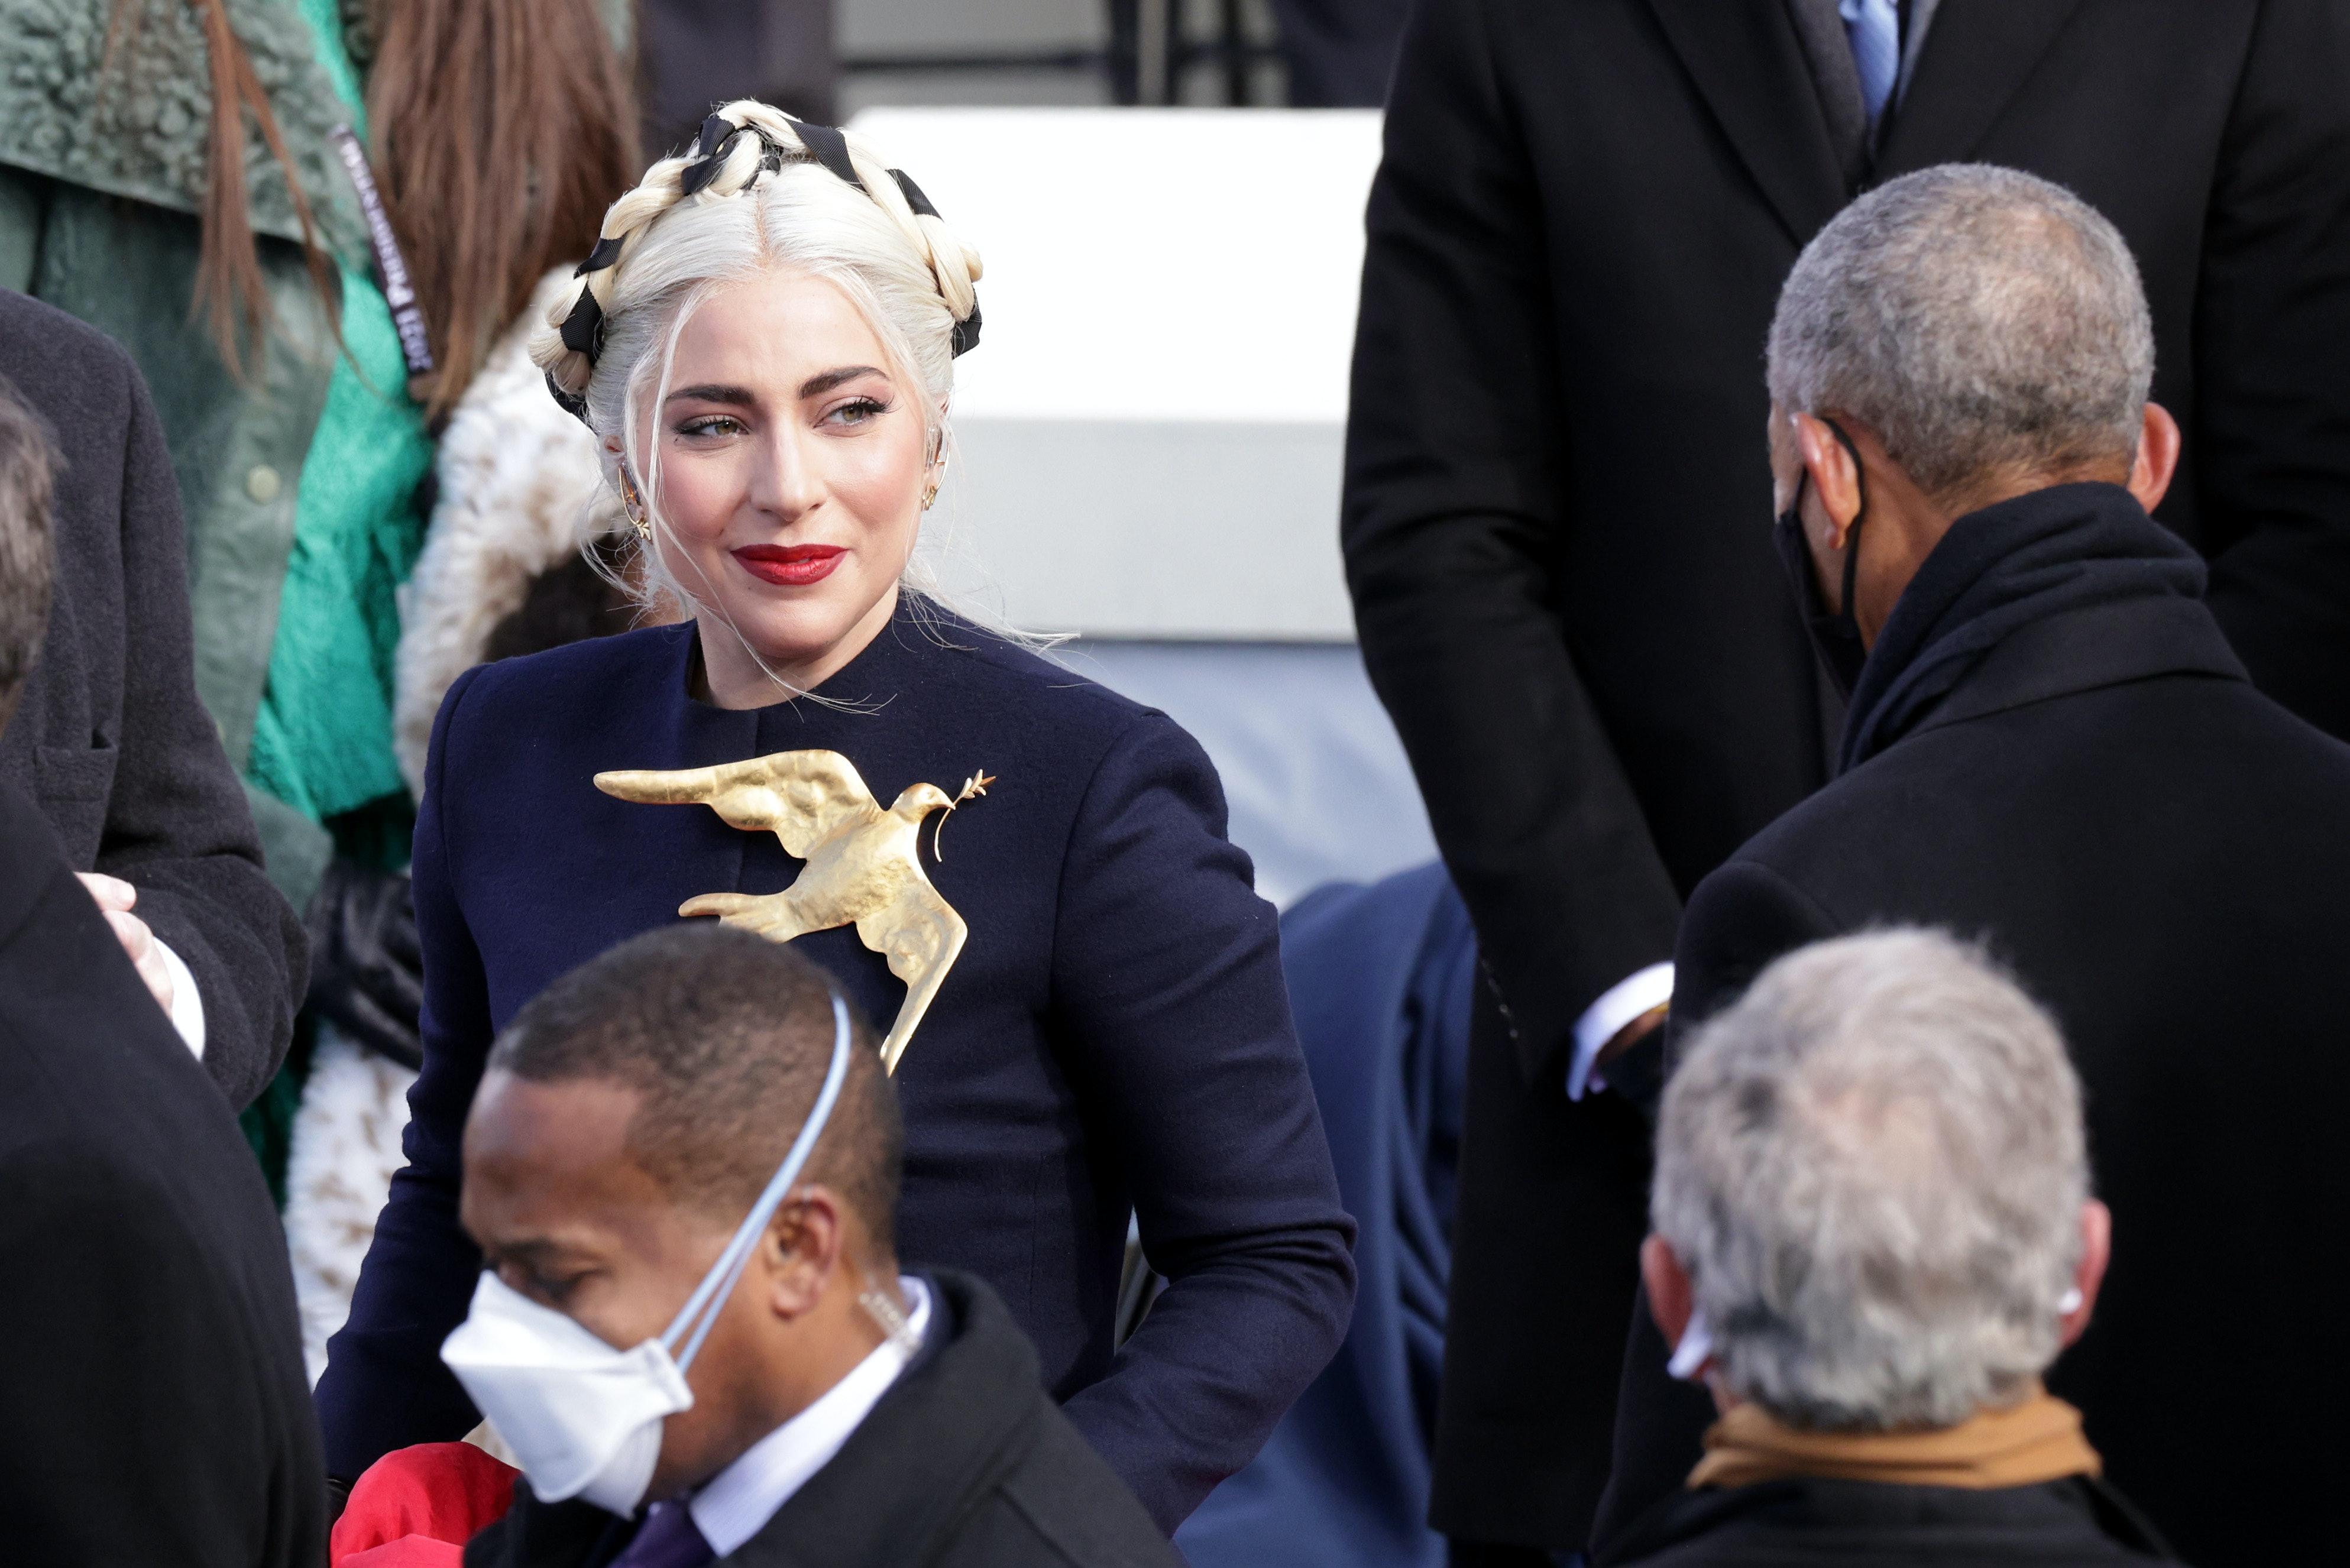 Inauguration Gaga Peace Dove Brooch